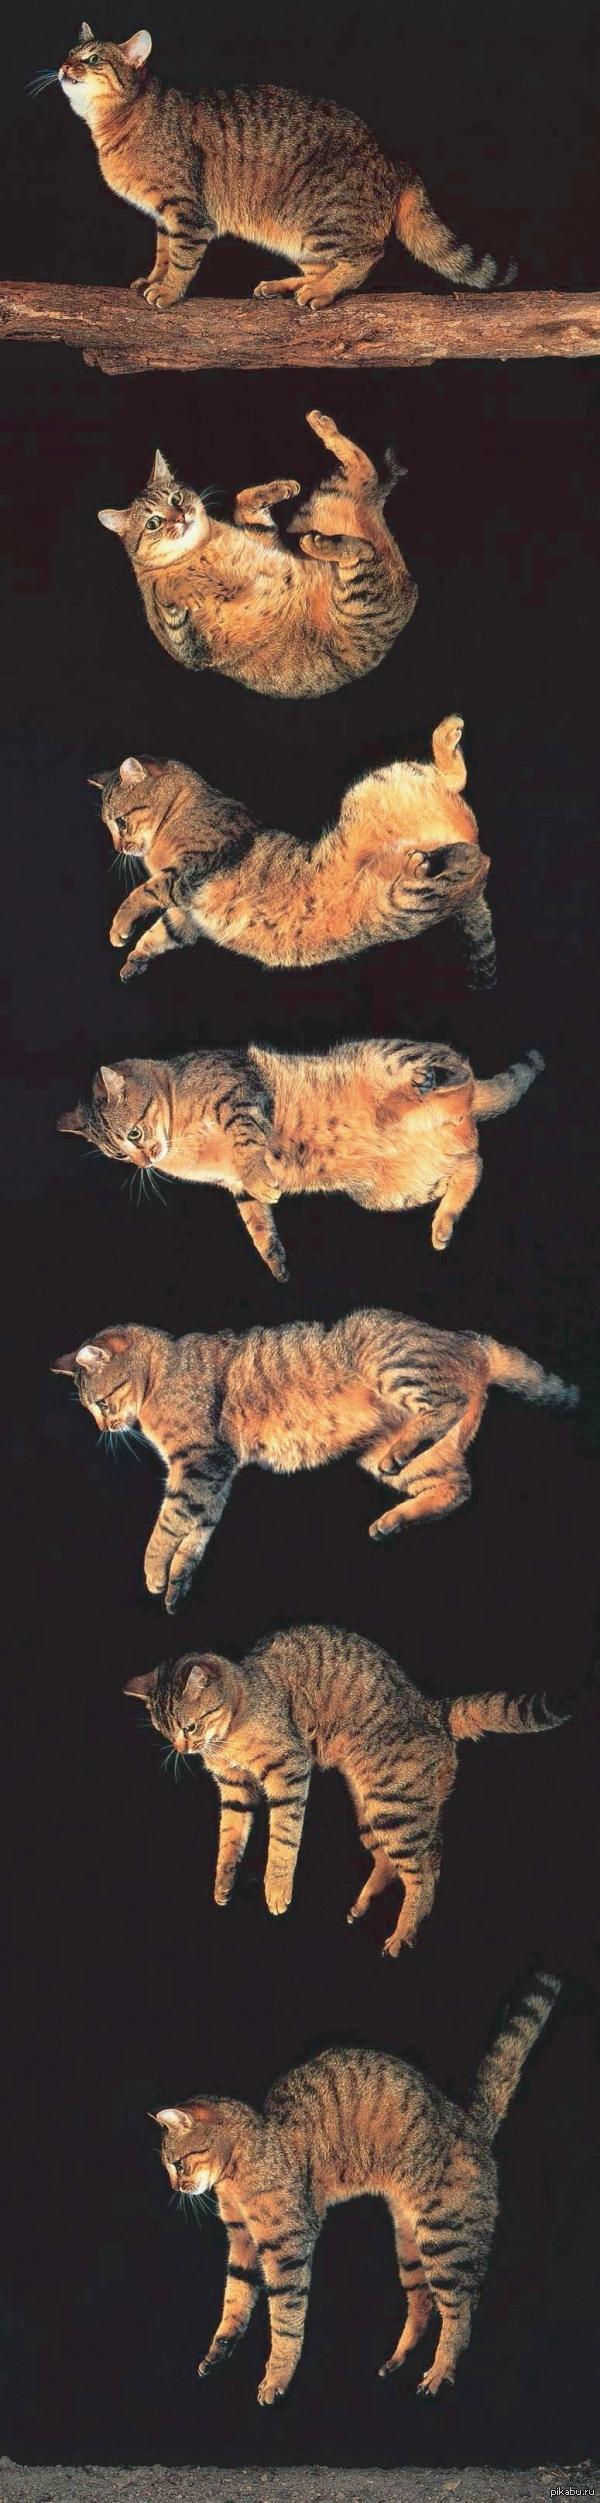 Почему кот падает на лапы